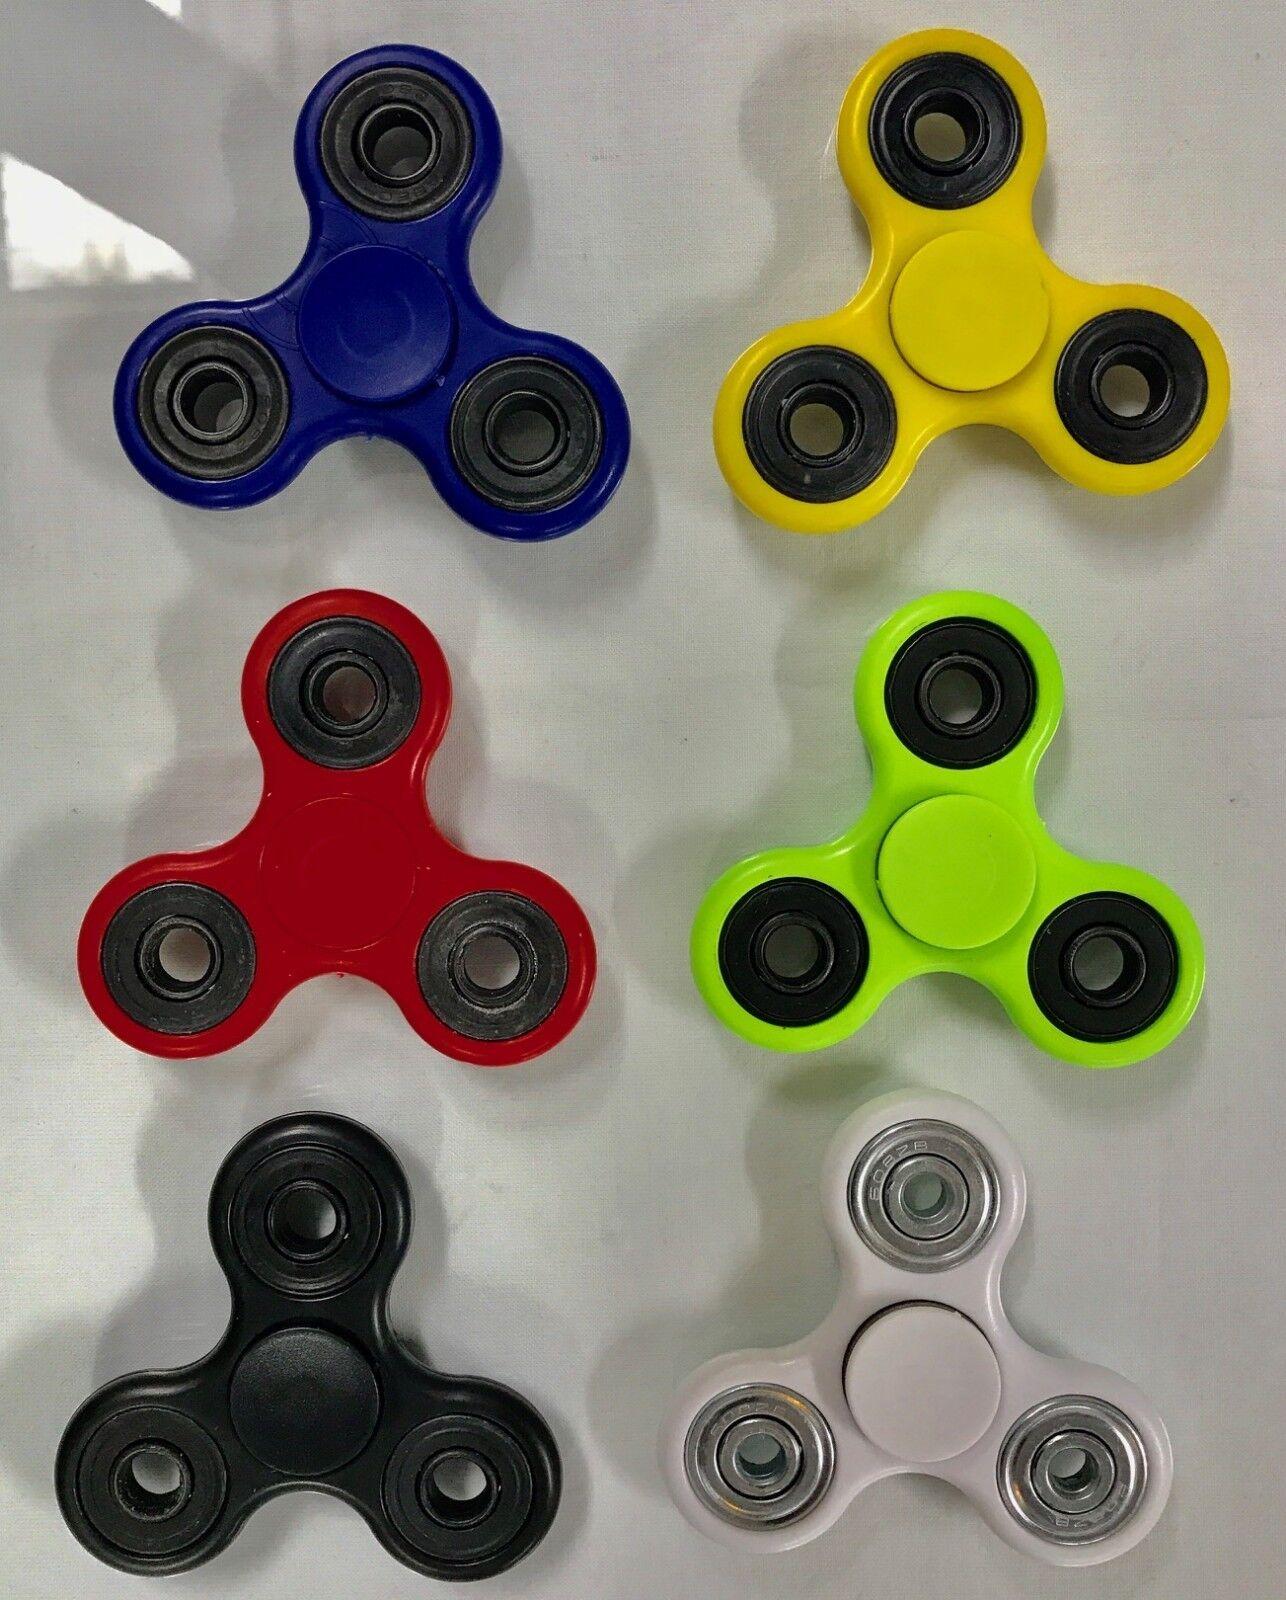 10-Qty Tri-Spinner Fidget Toy Hand Finger Spinner Multiple Colorees-USA Seller